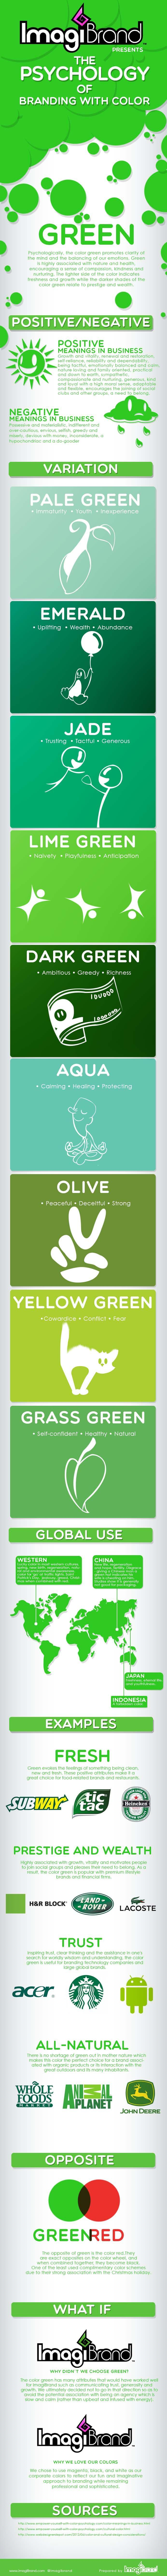 The Psychology of GREEN #Branding by Richie Kawamoto #SM4Biz #contentmarketing #infographic